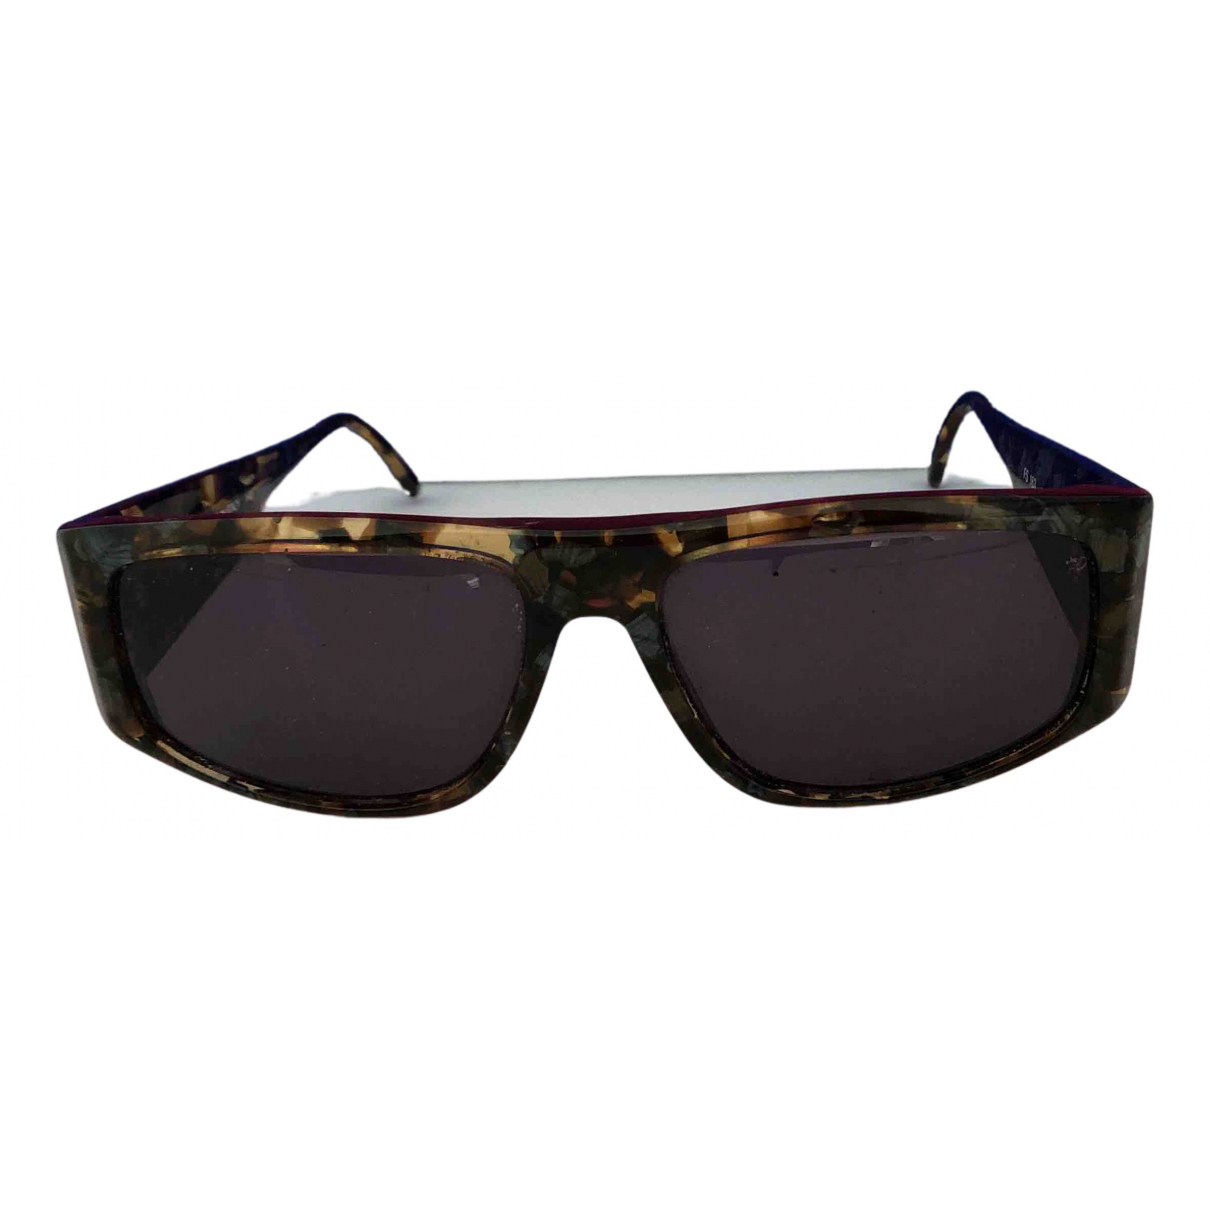 Fendi N Brown Sunglasses for Women N